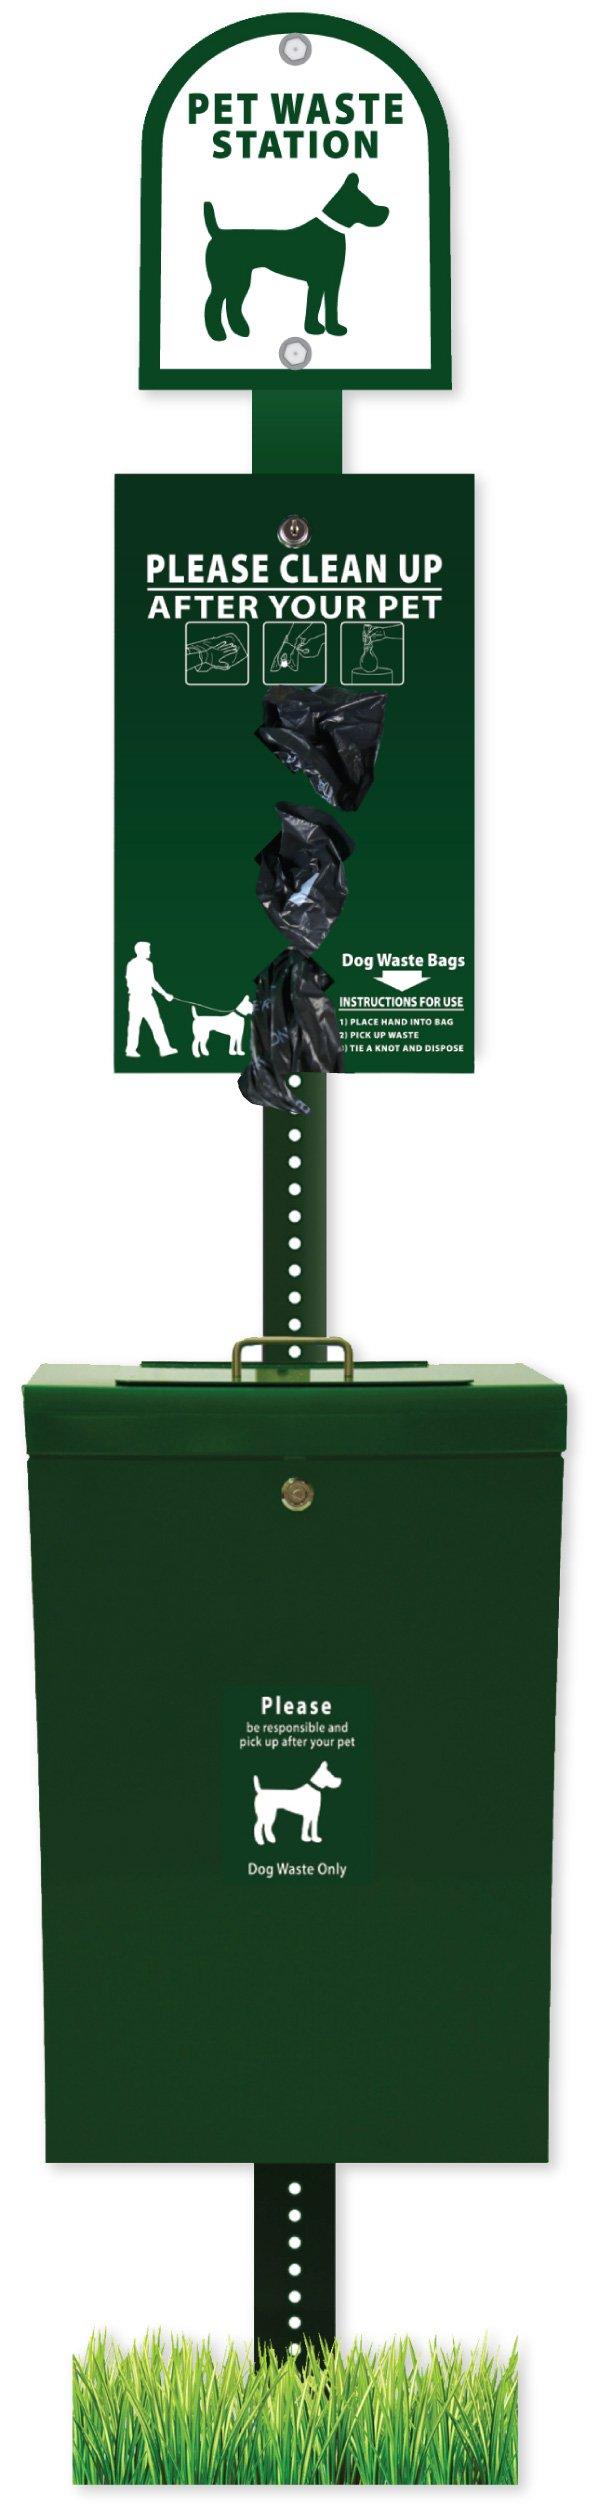 ZeroWaste Gladiator Dog Waste Station with Roll Bag Waste System